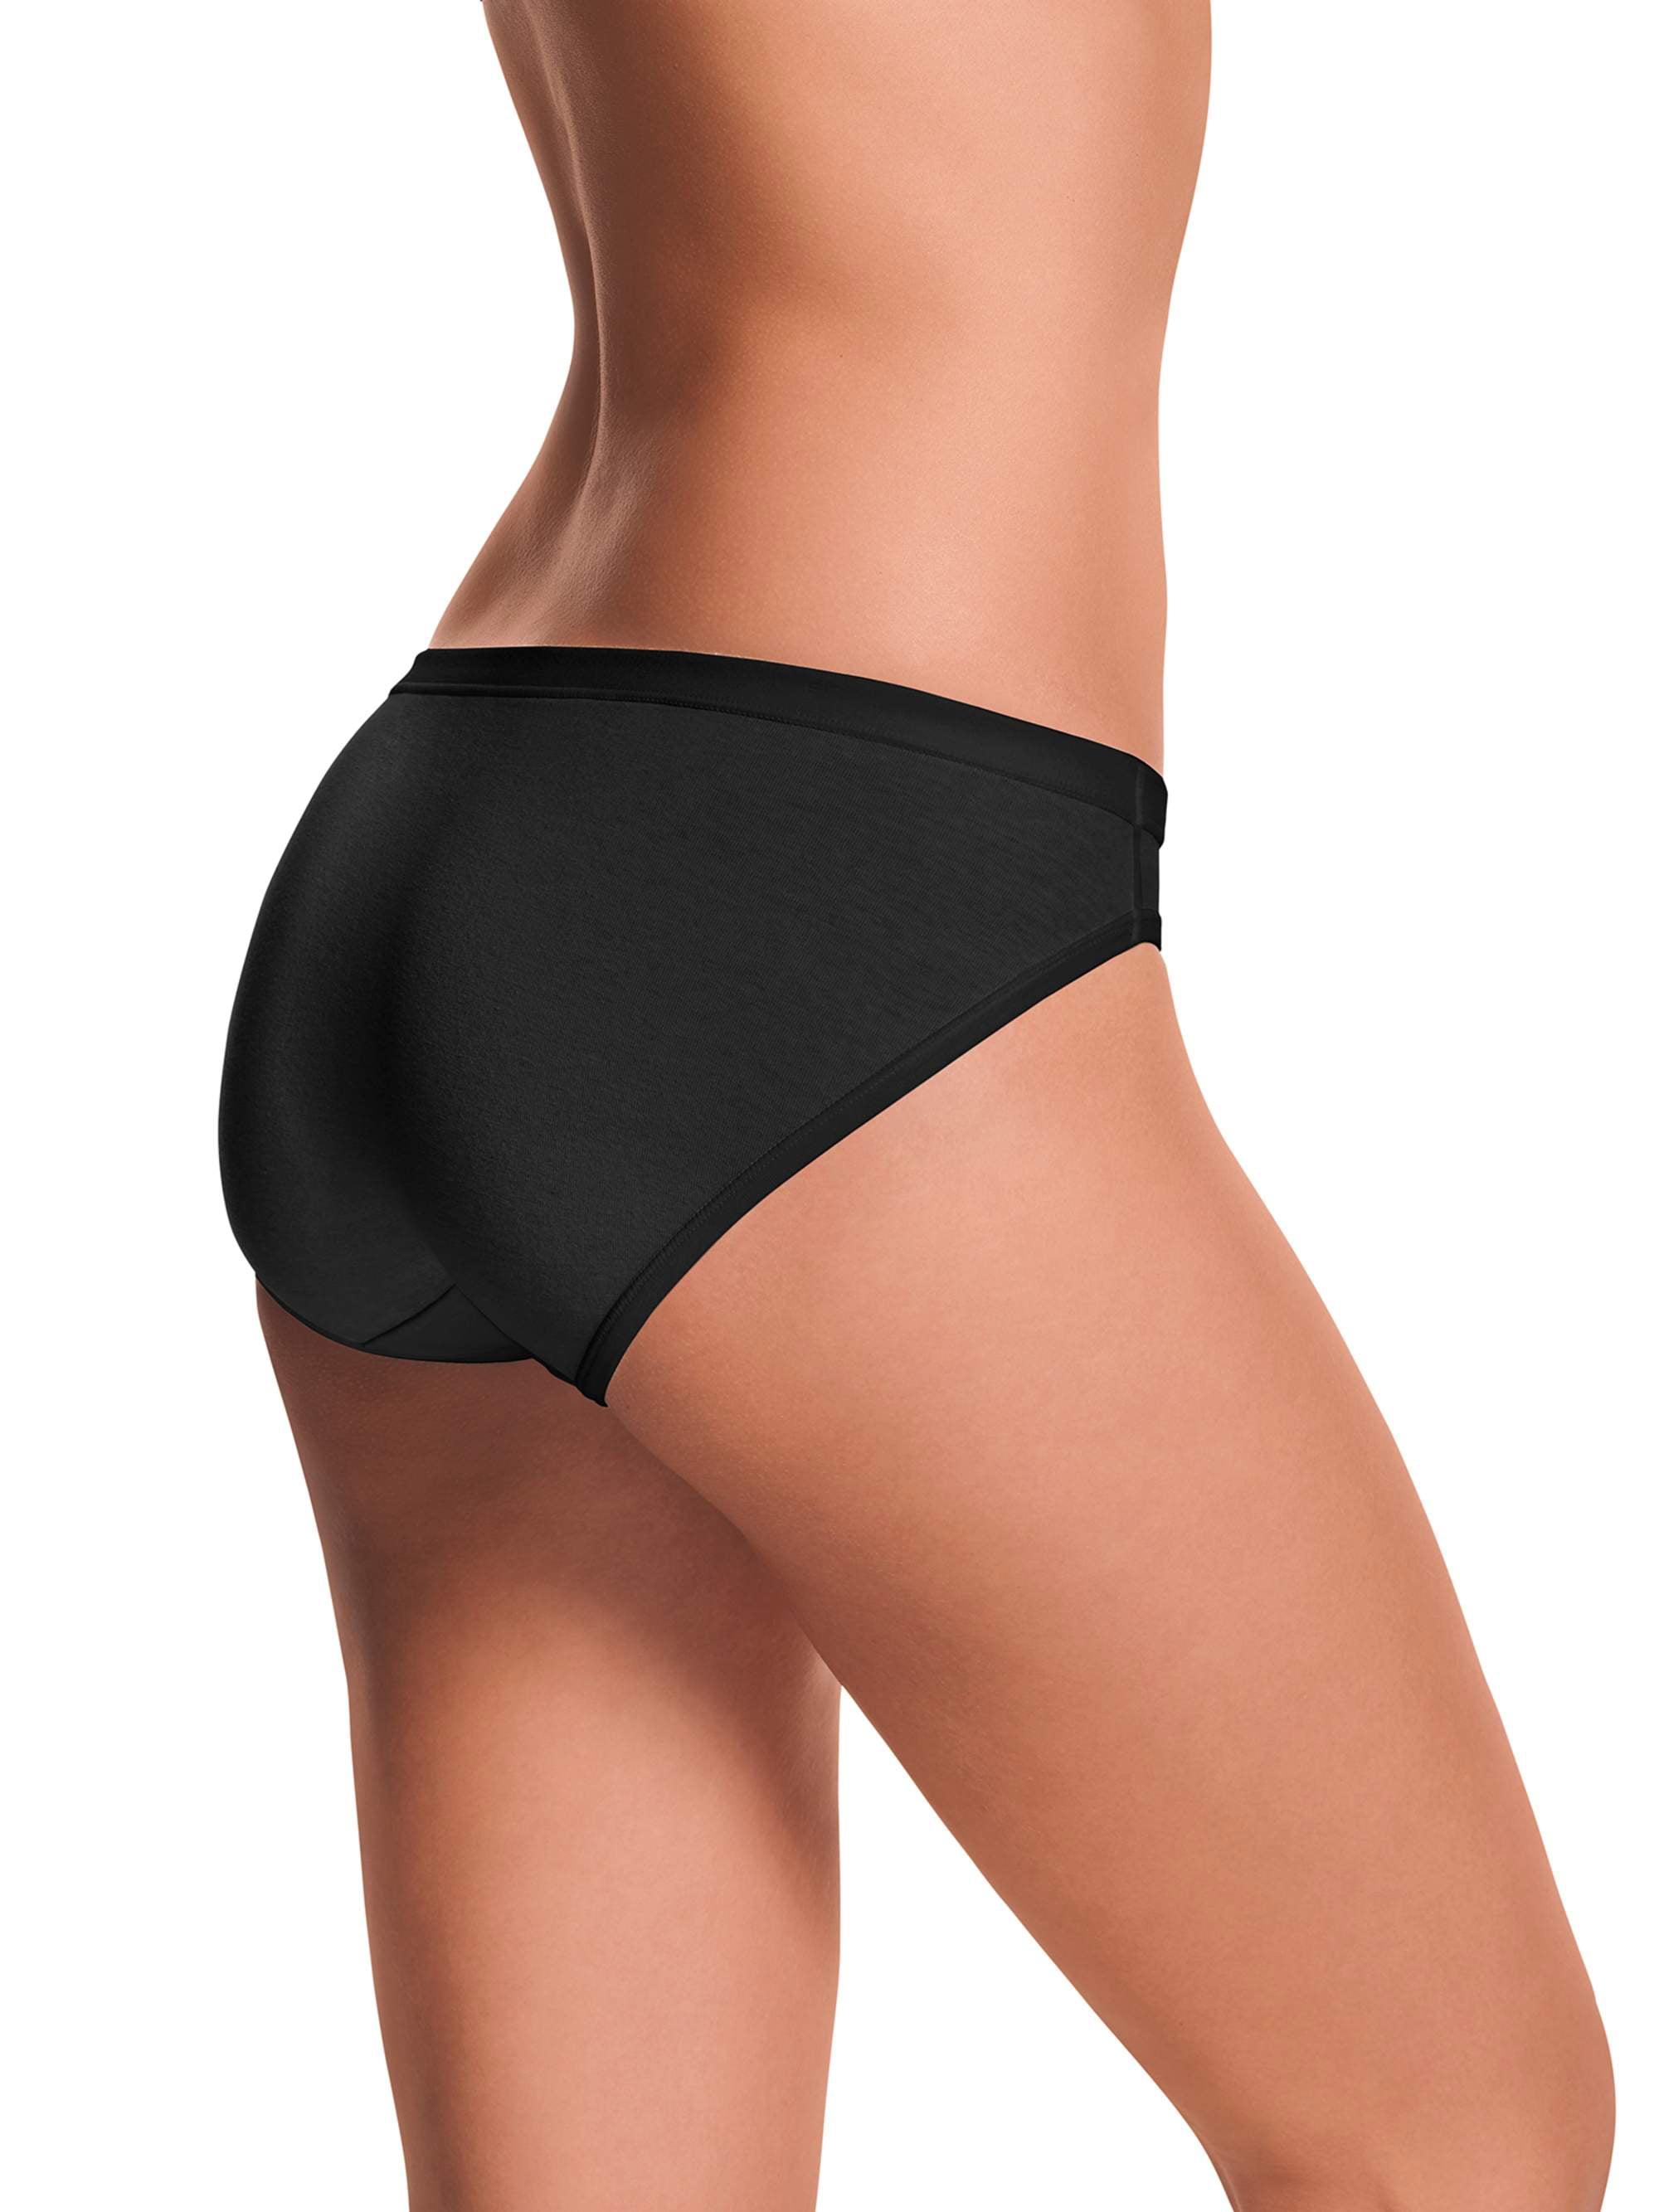 f561ca98468a Hanes - Women's Assorted Cotton Stretch Bikini Panties - 3 Pack -  Walmart.com